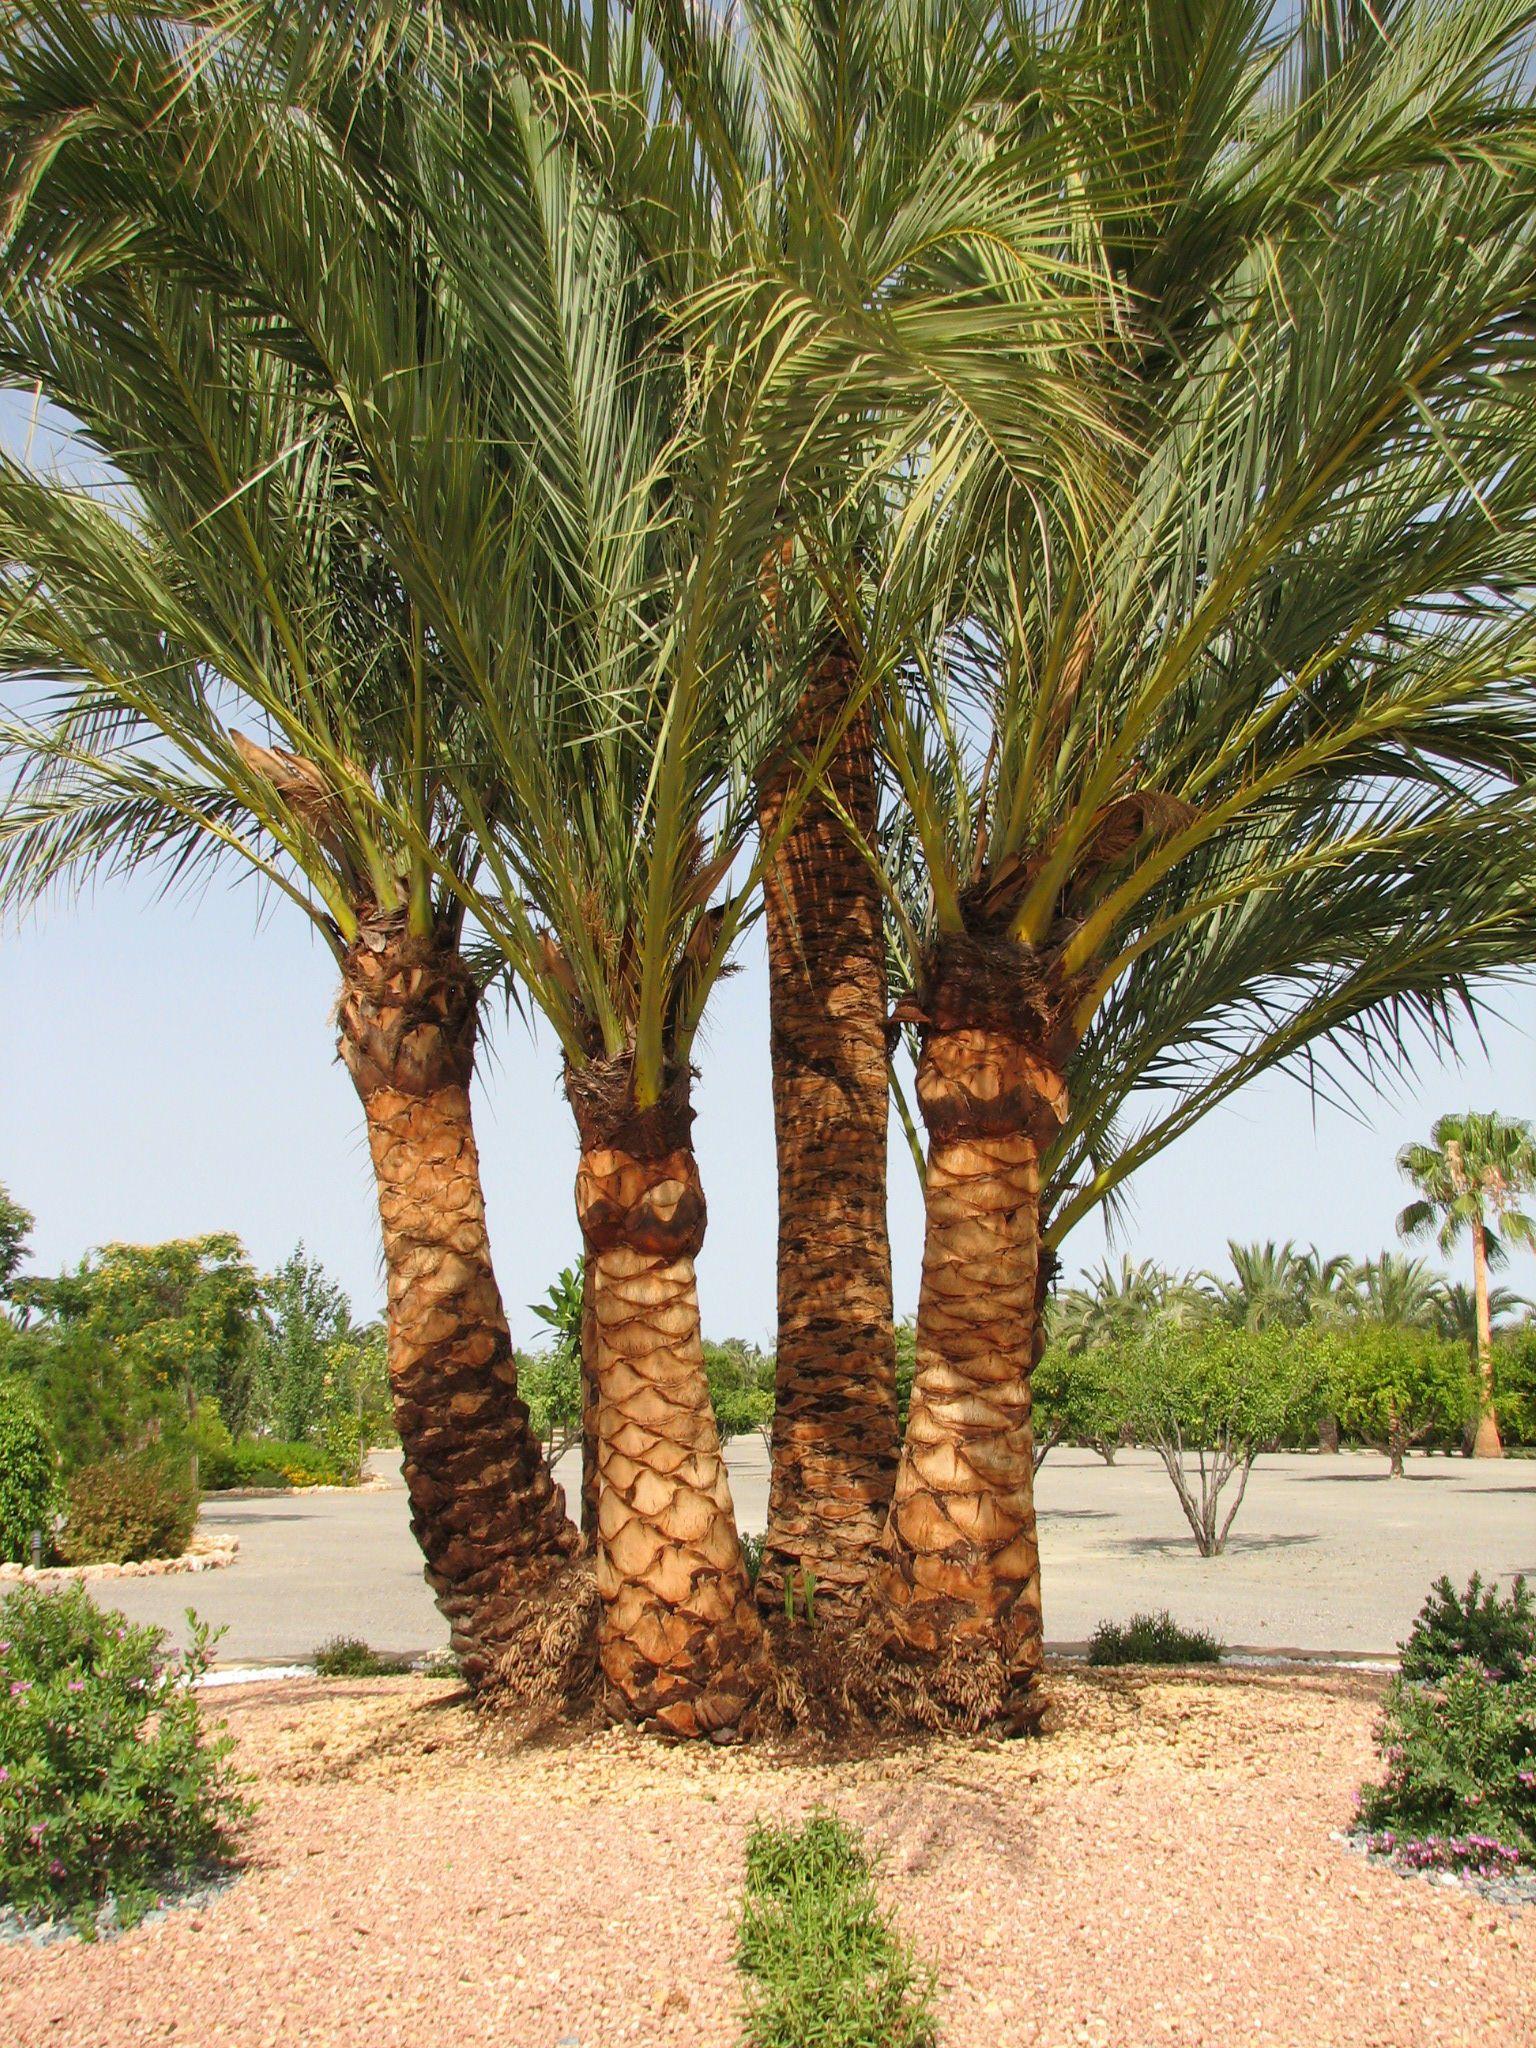 Poda de palmeras Alicante